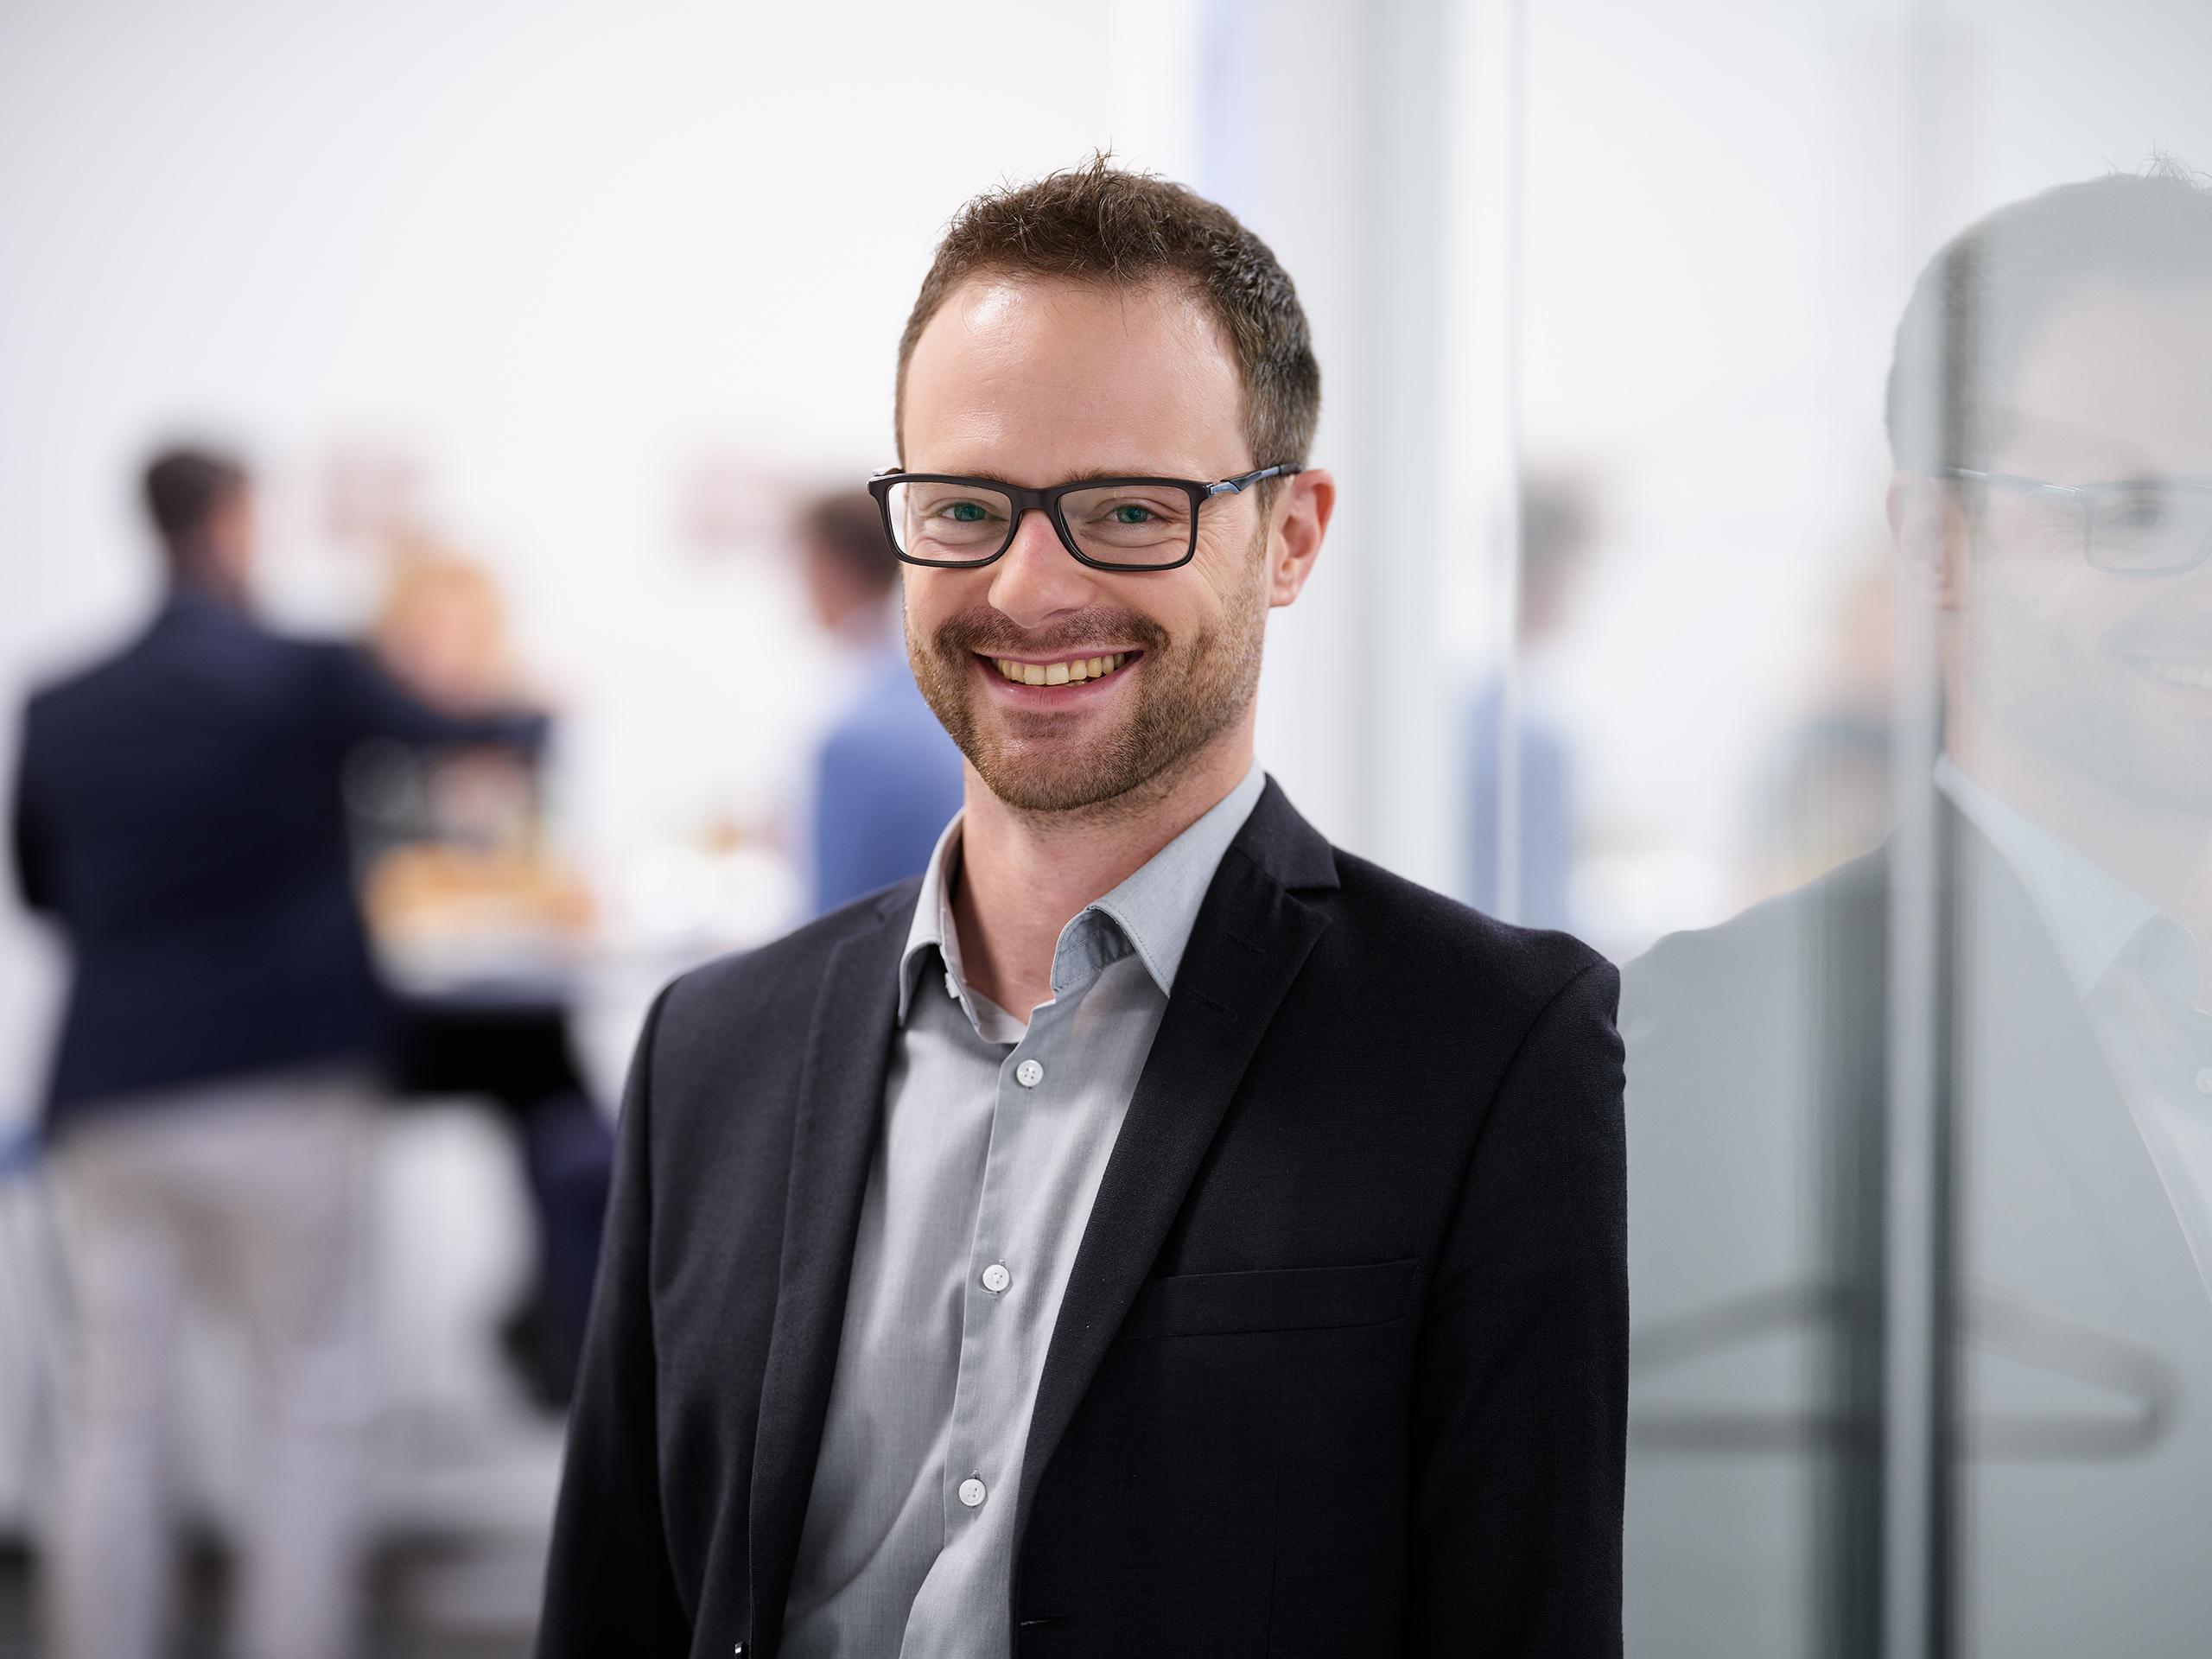 Marc-Thorben Hammel, Bachelor of Arts